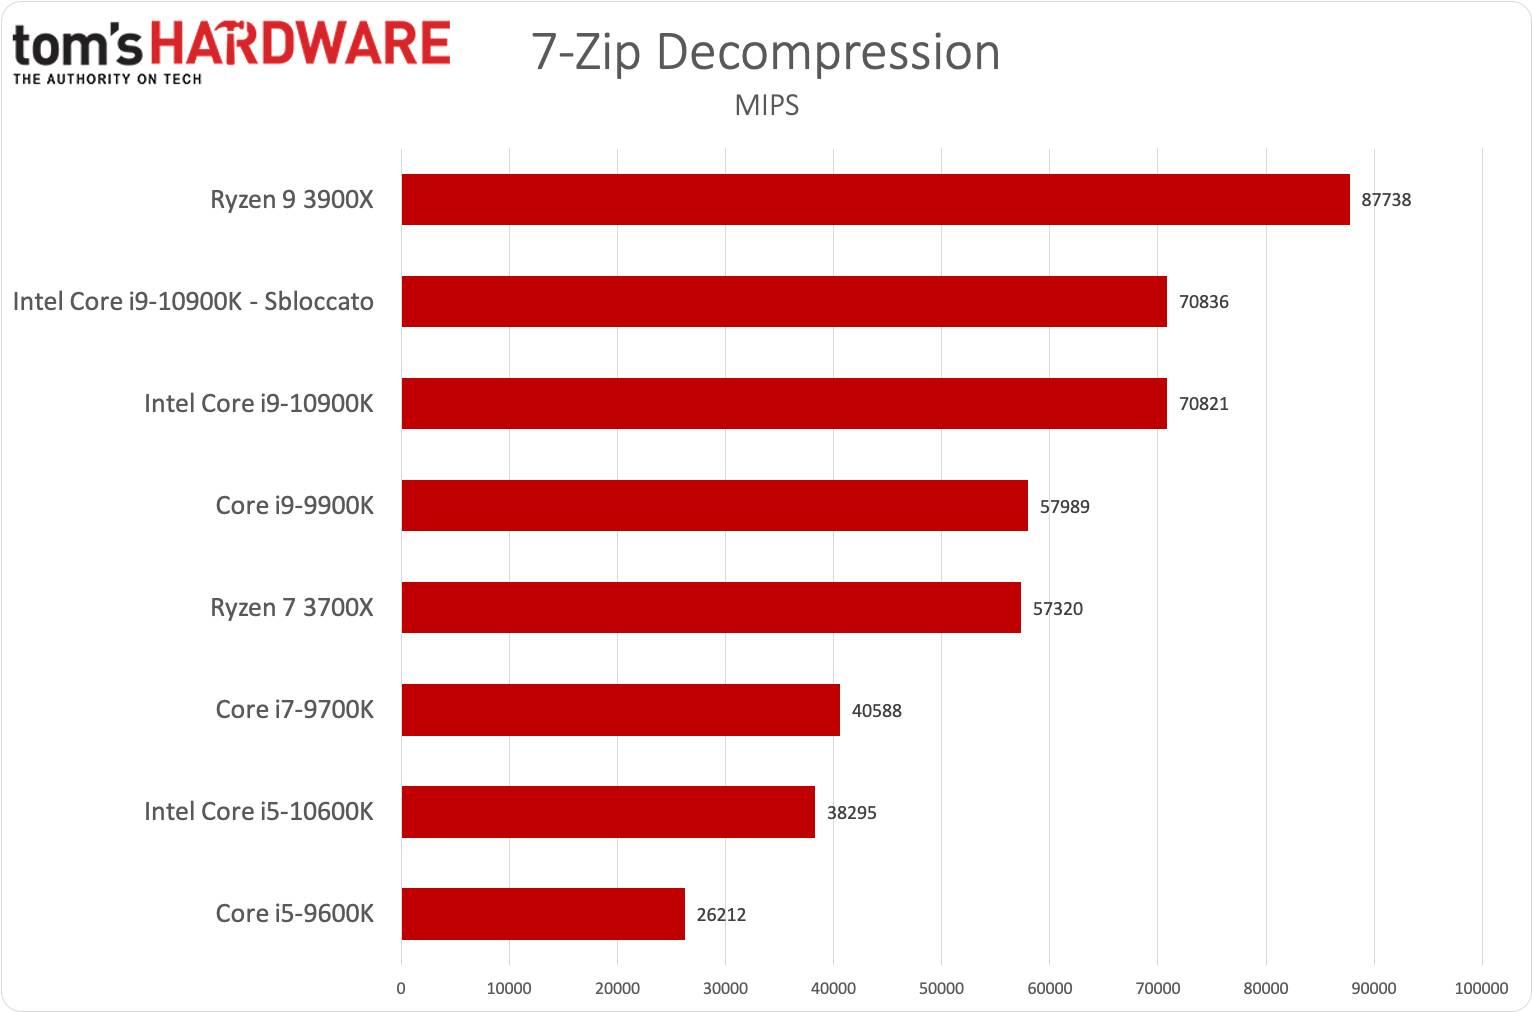 Benchmark i9-10900K e i5-10600K - 7-Zip decompression